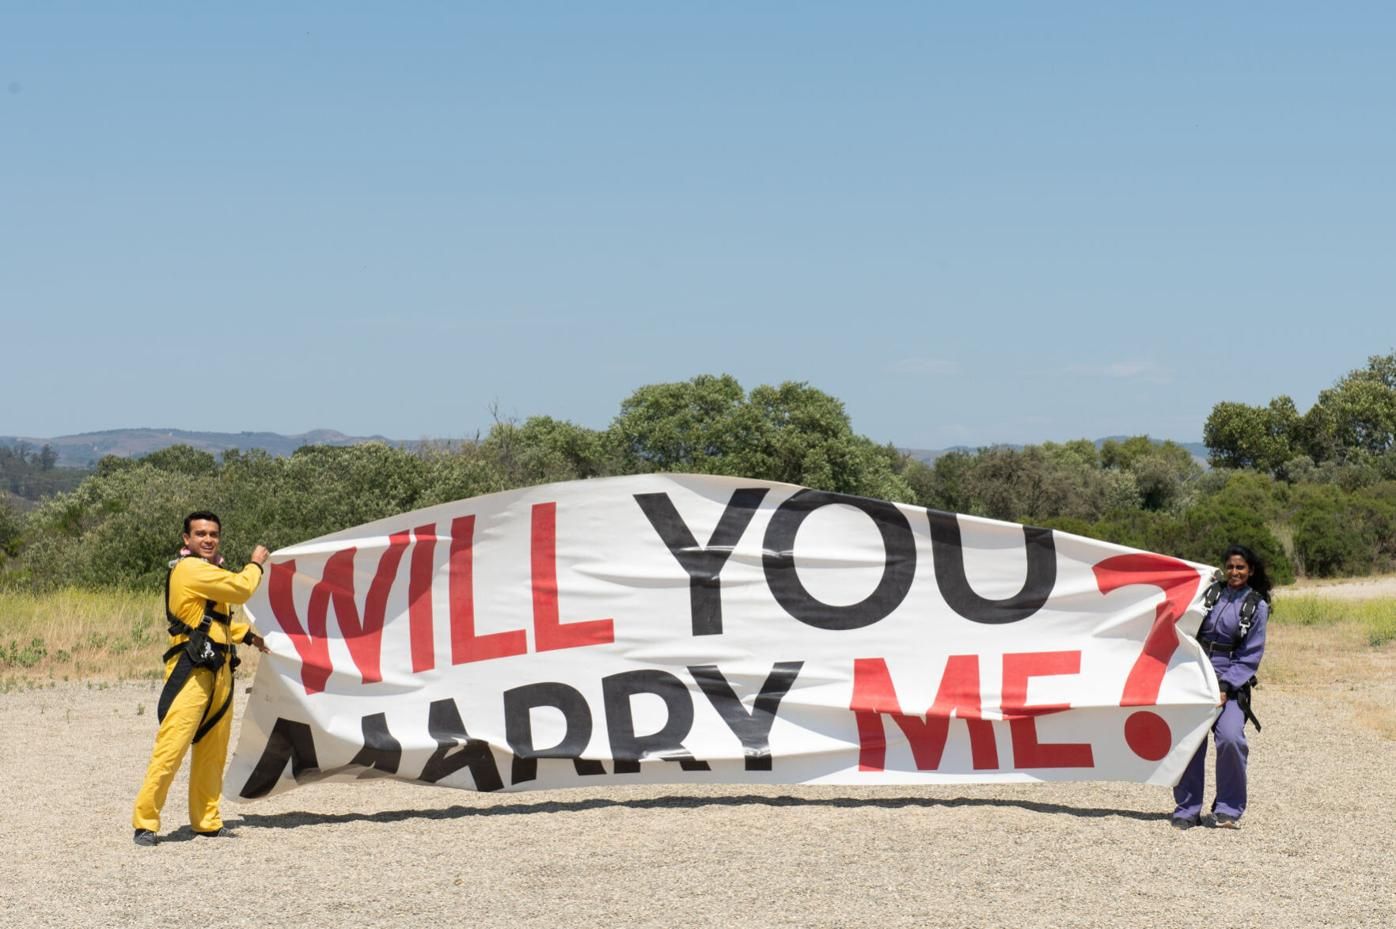 071921 Skydiving proposal 1